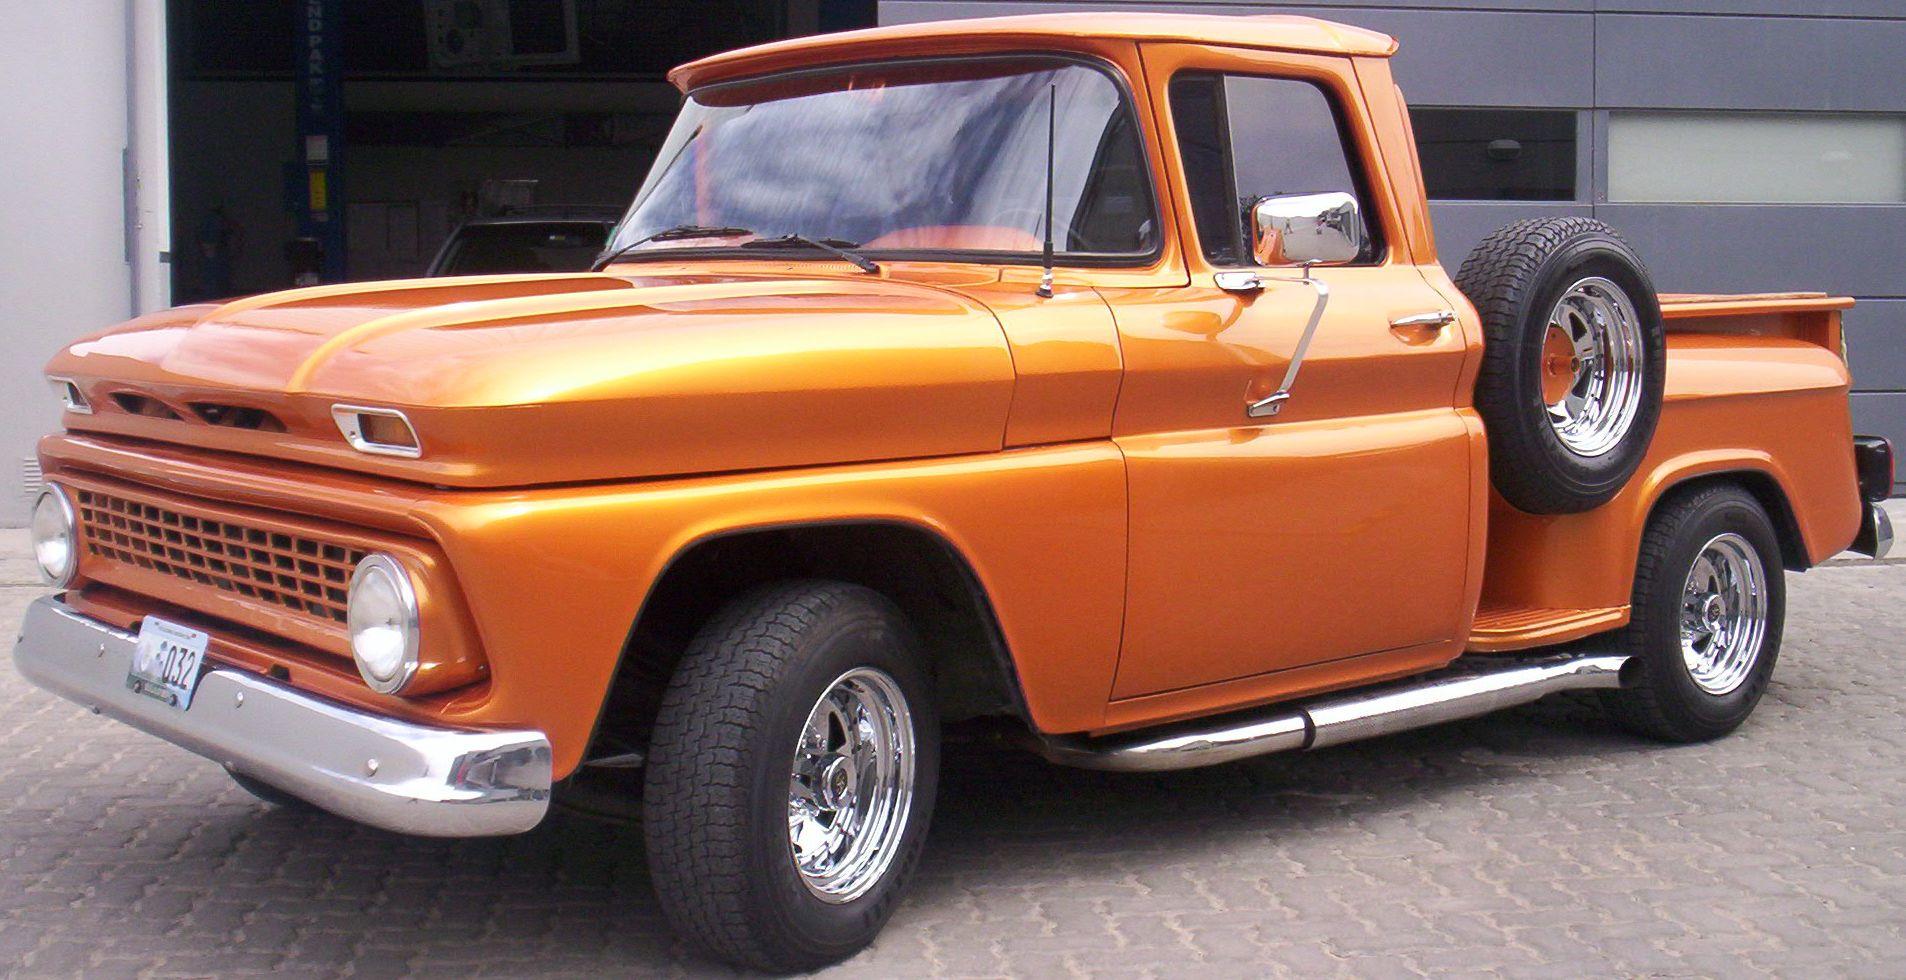 Truck 1963 chevy truck parts : Chevrolet Apache 1963. http://www.arcar.org/autosantiguos.aspx?qmo ...